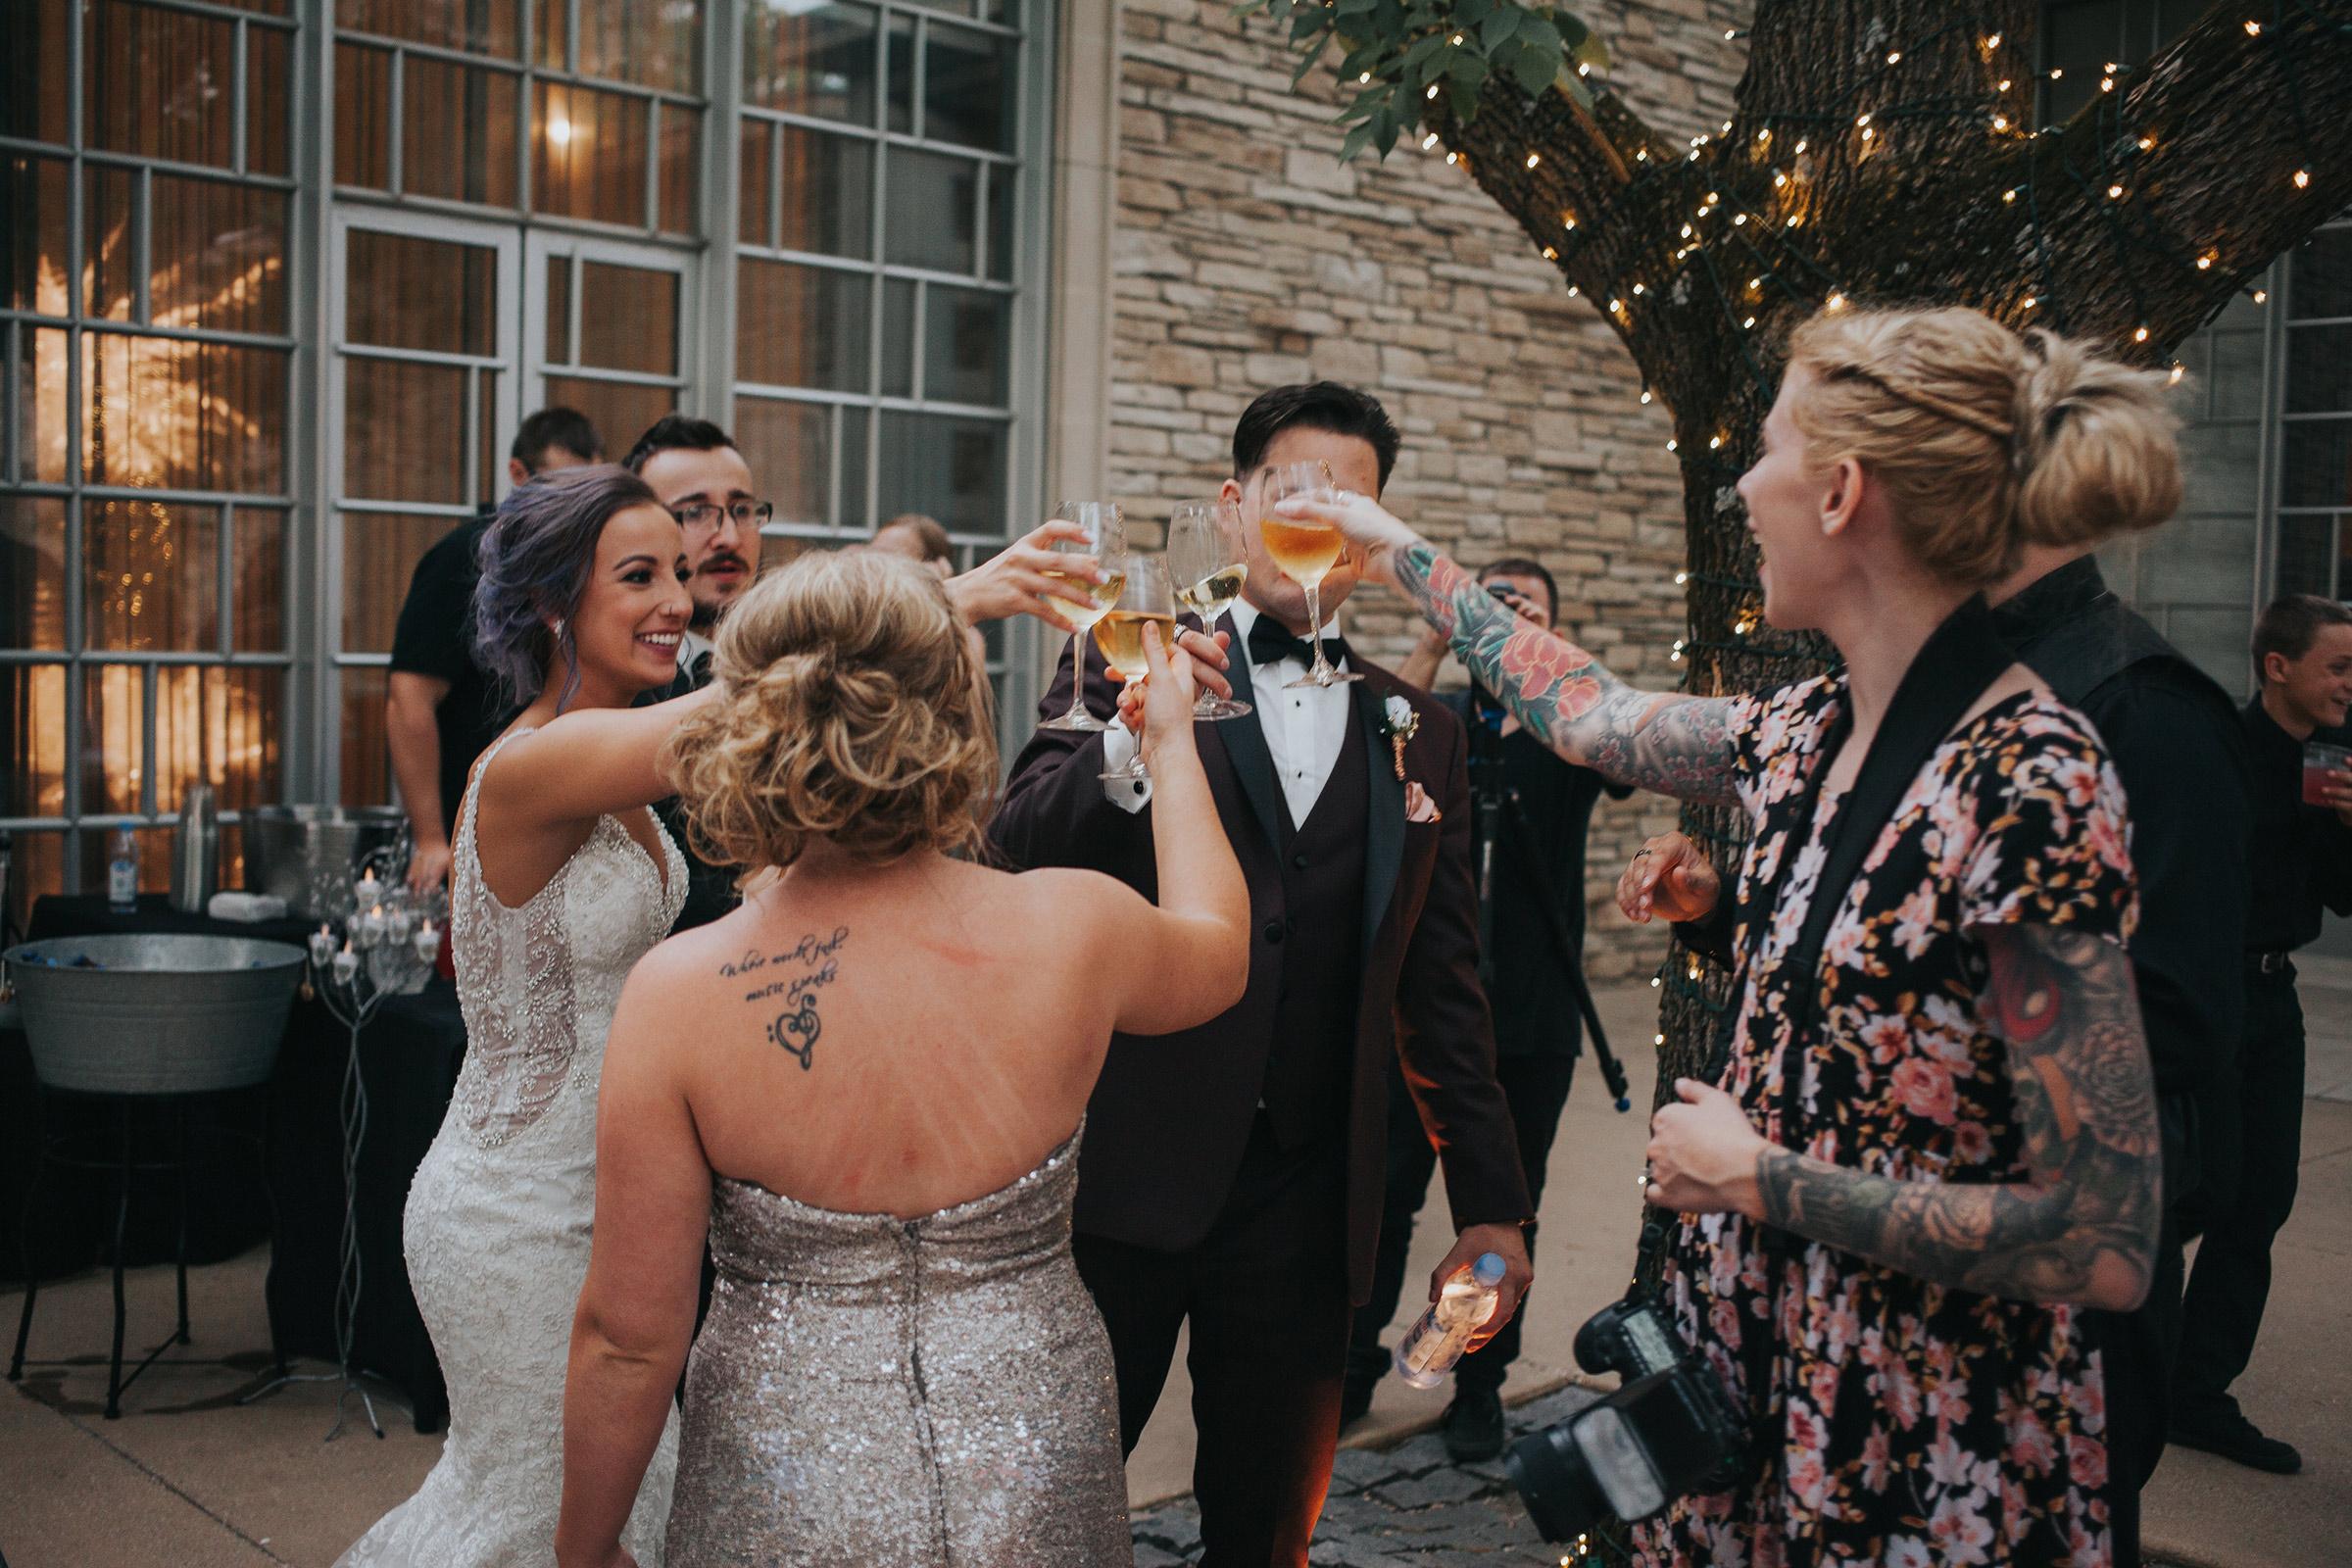 photographers-cheers-with-wedding-couple-desmoines-iowa-art-center-raelyn-ramey-photography.jpg